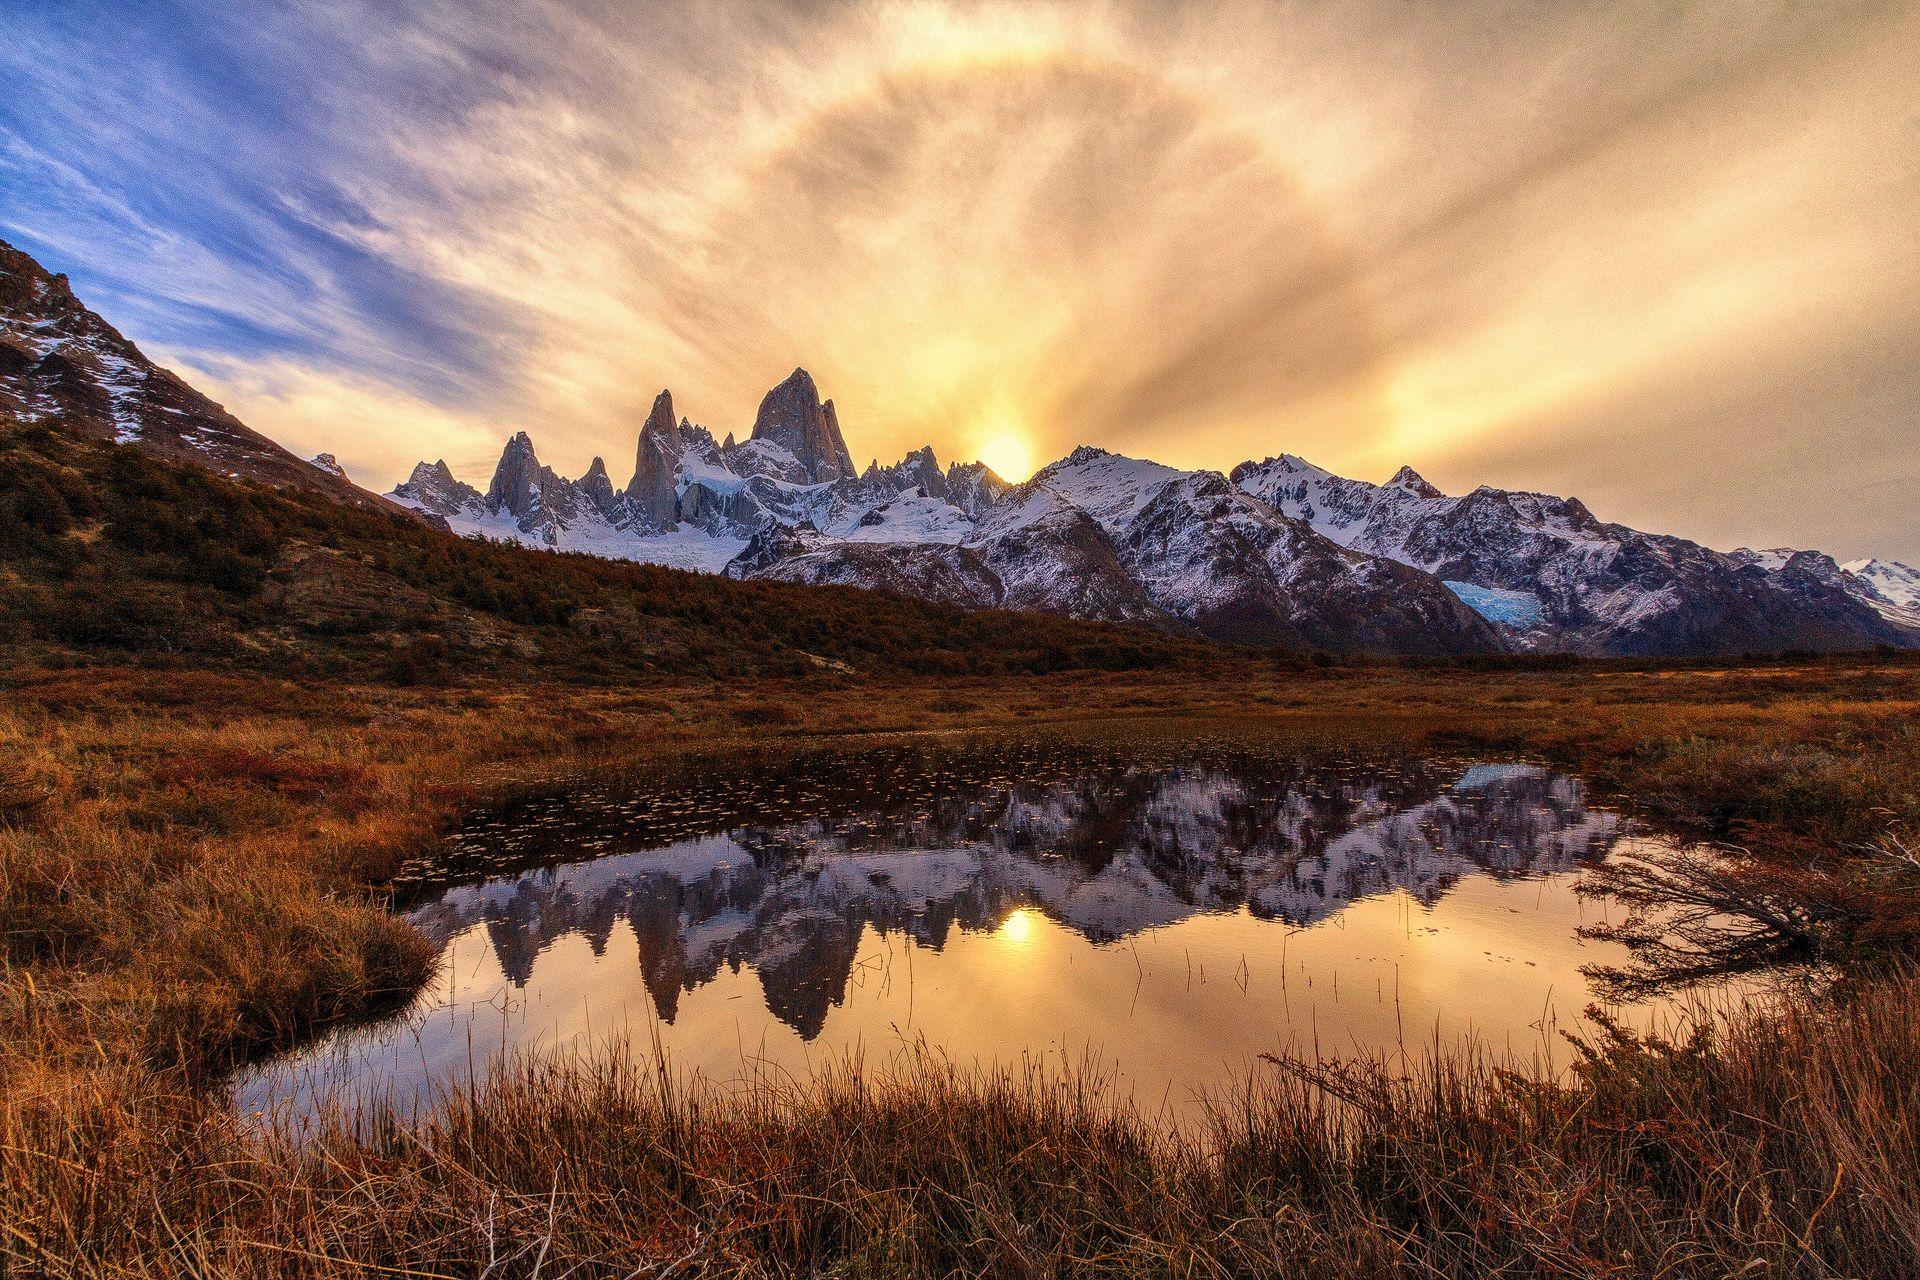 Cerro Fitz Roy, El Chalten, Argentina, Chile, Patagonia, Andes, Mountain, Sunset, Lake, Reflection, Landscape